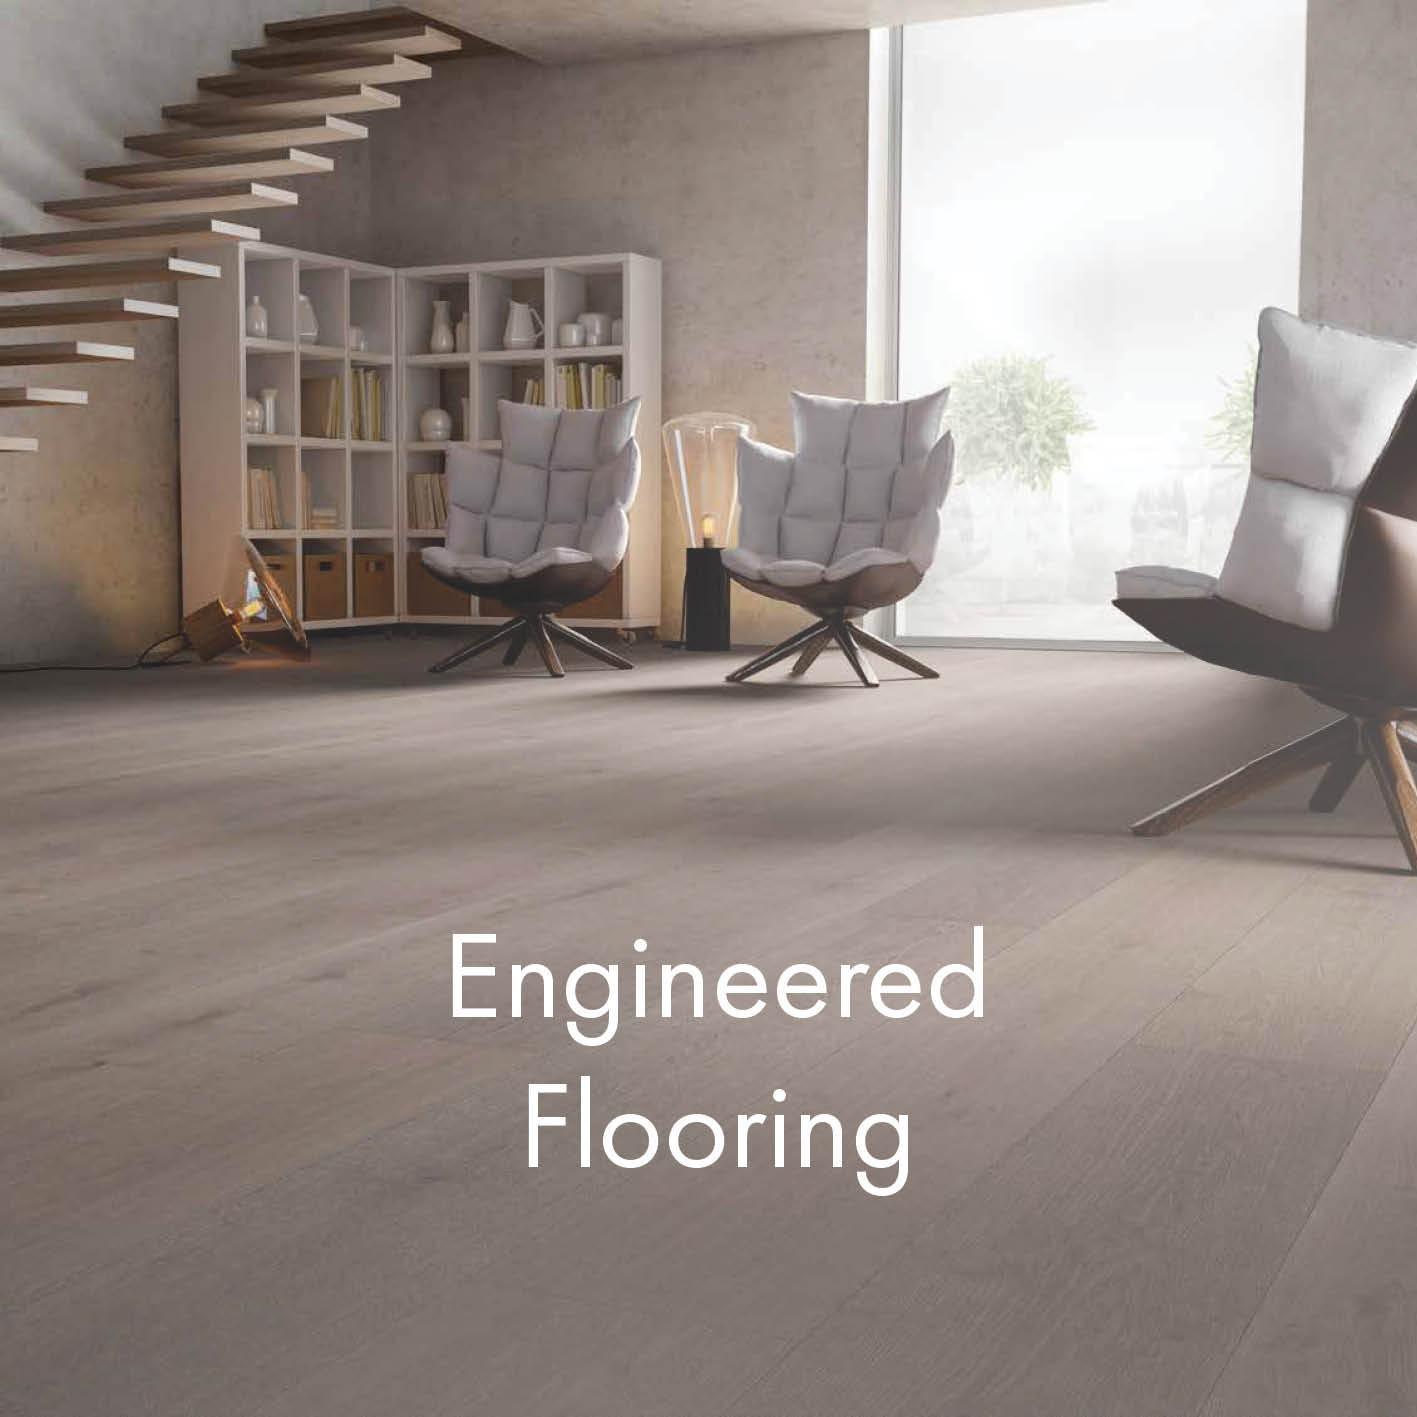 engineered flooring button.jpg